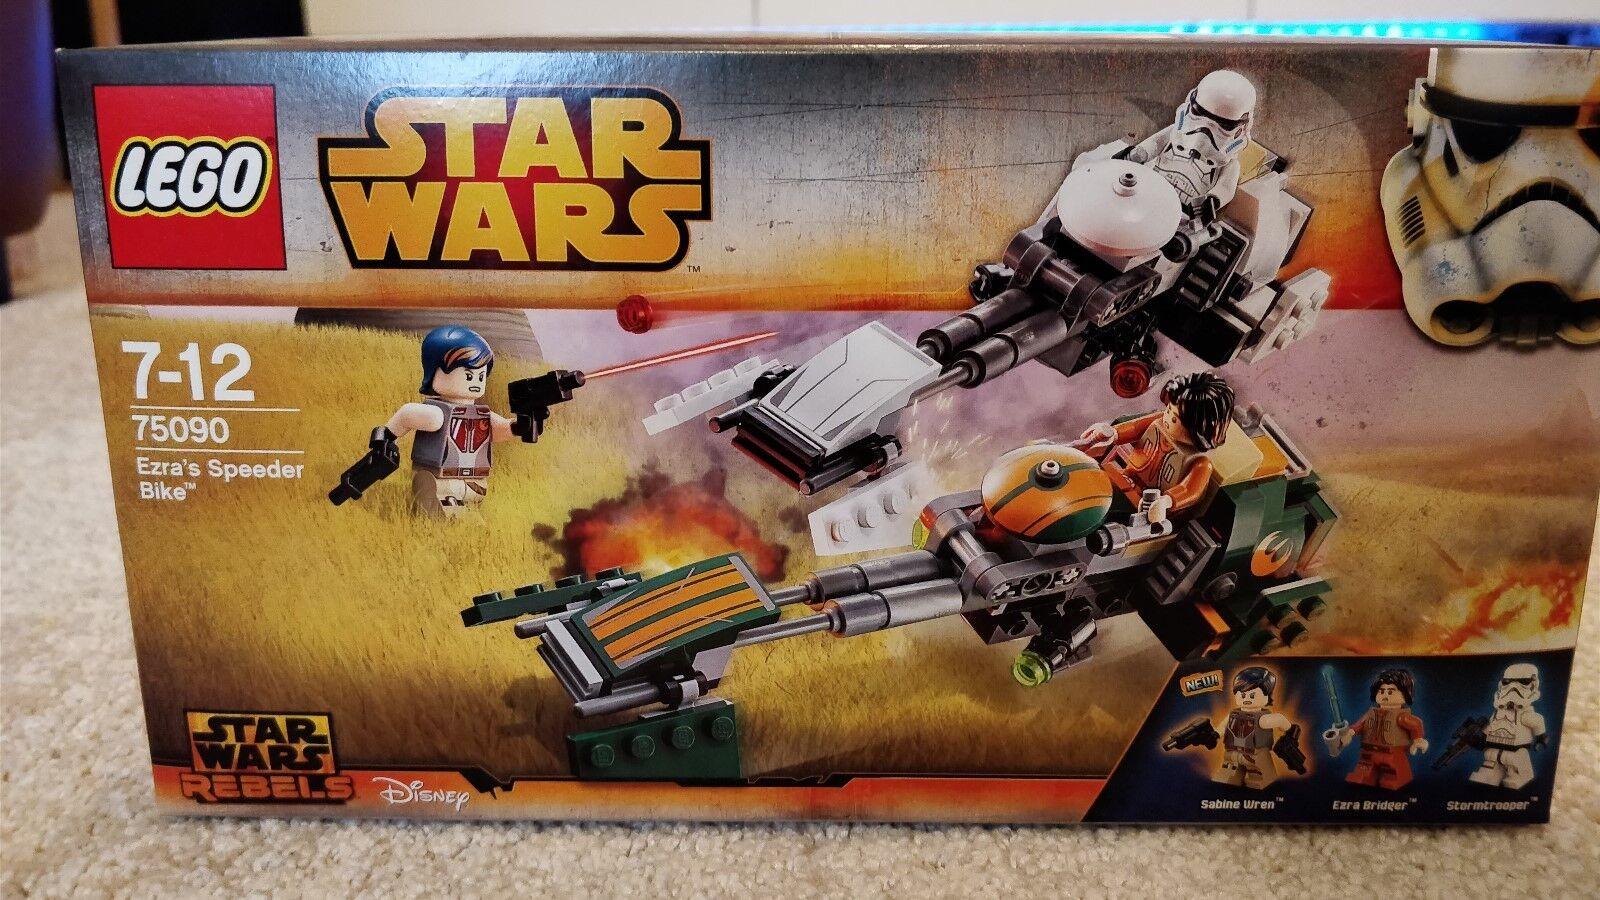 Lego Star Wars Rebels 75090 Ezra's Speeder Bike NEW SEALED BNISB